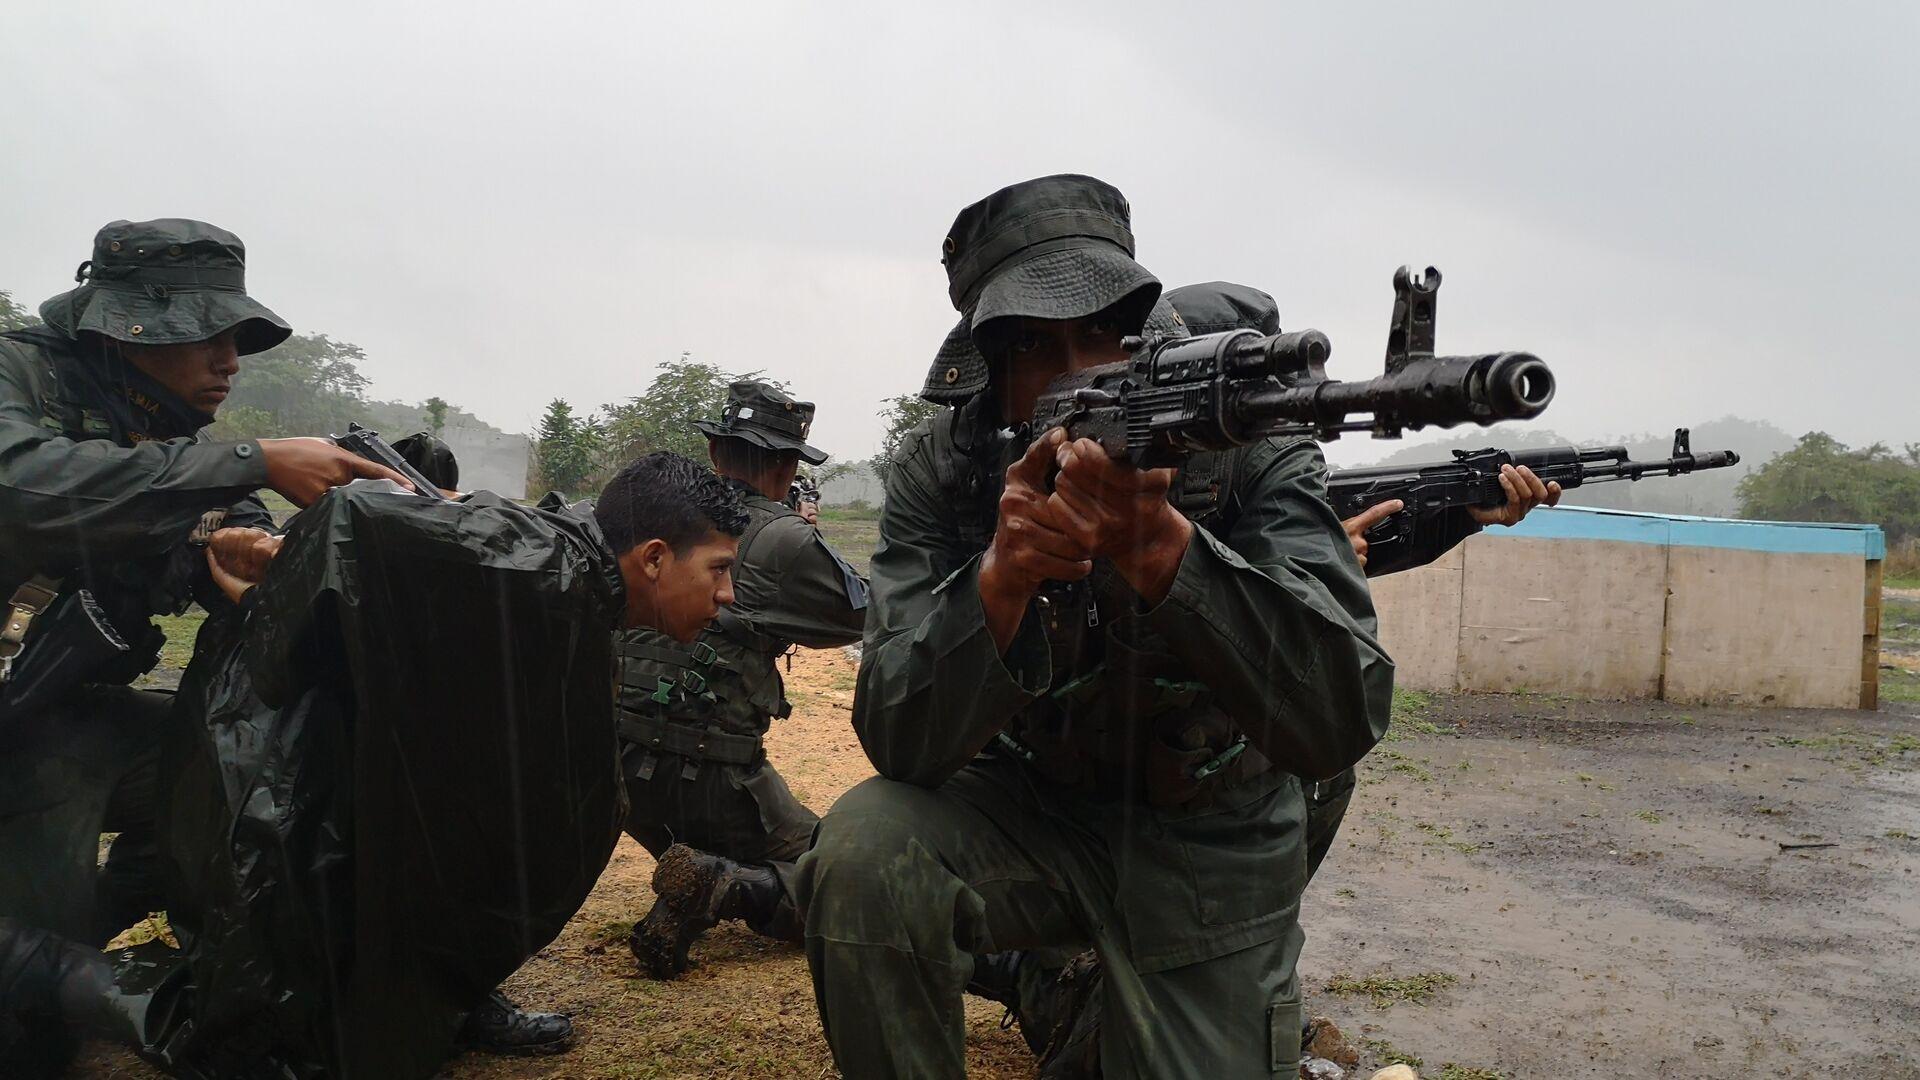 Cadetes de la Academia de la Guardia Nacional Bolivariana, en la cancha de combate en áreas construidas - Sputnik Mundo, 1920, 09.07.2021